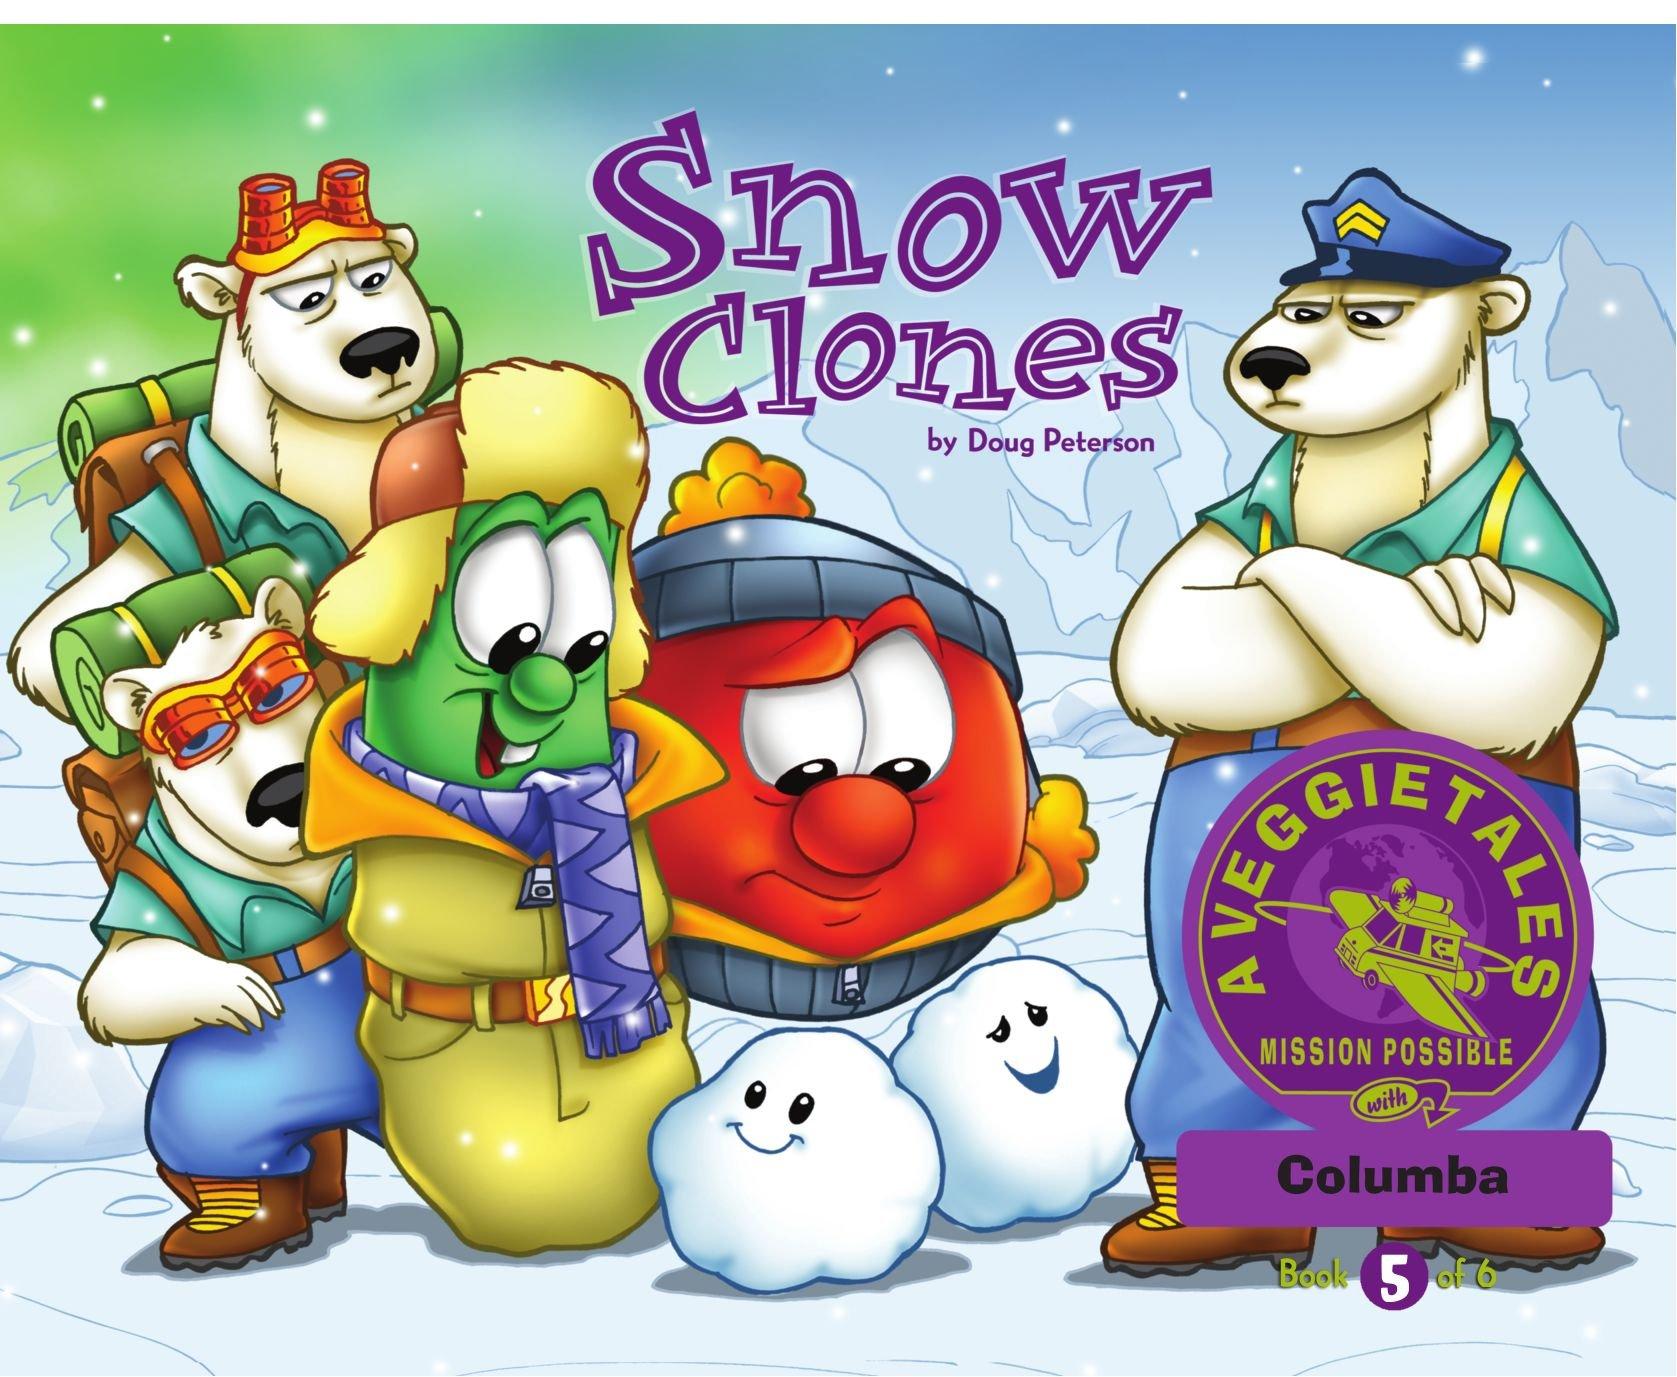 Snow Clones - VeggieTales Mission Possible Adventure Series #5: Personalized for Columba (Boy) PDF